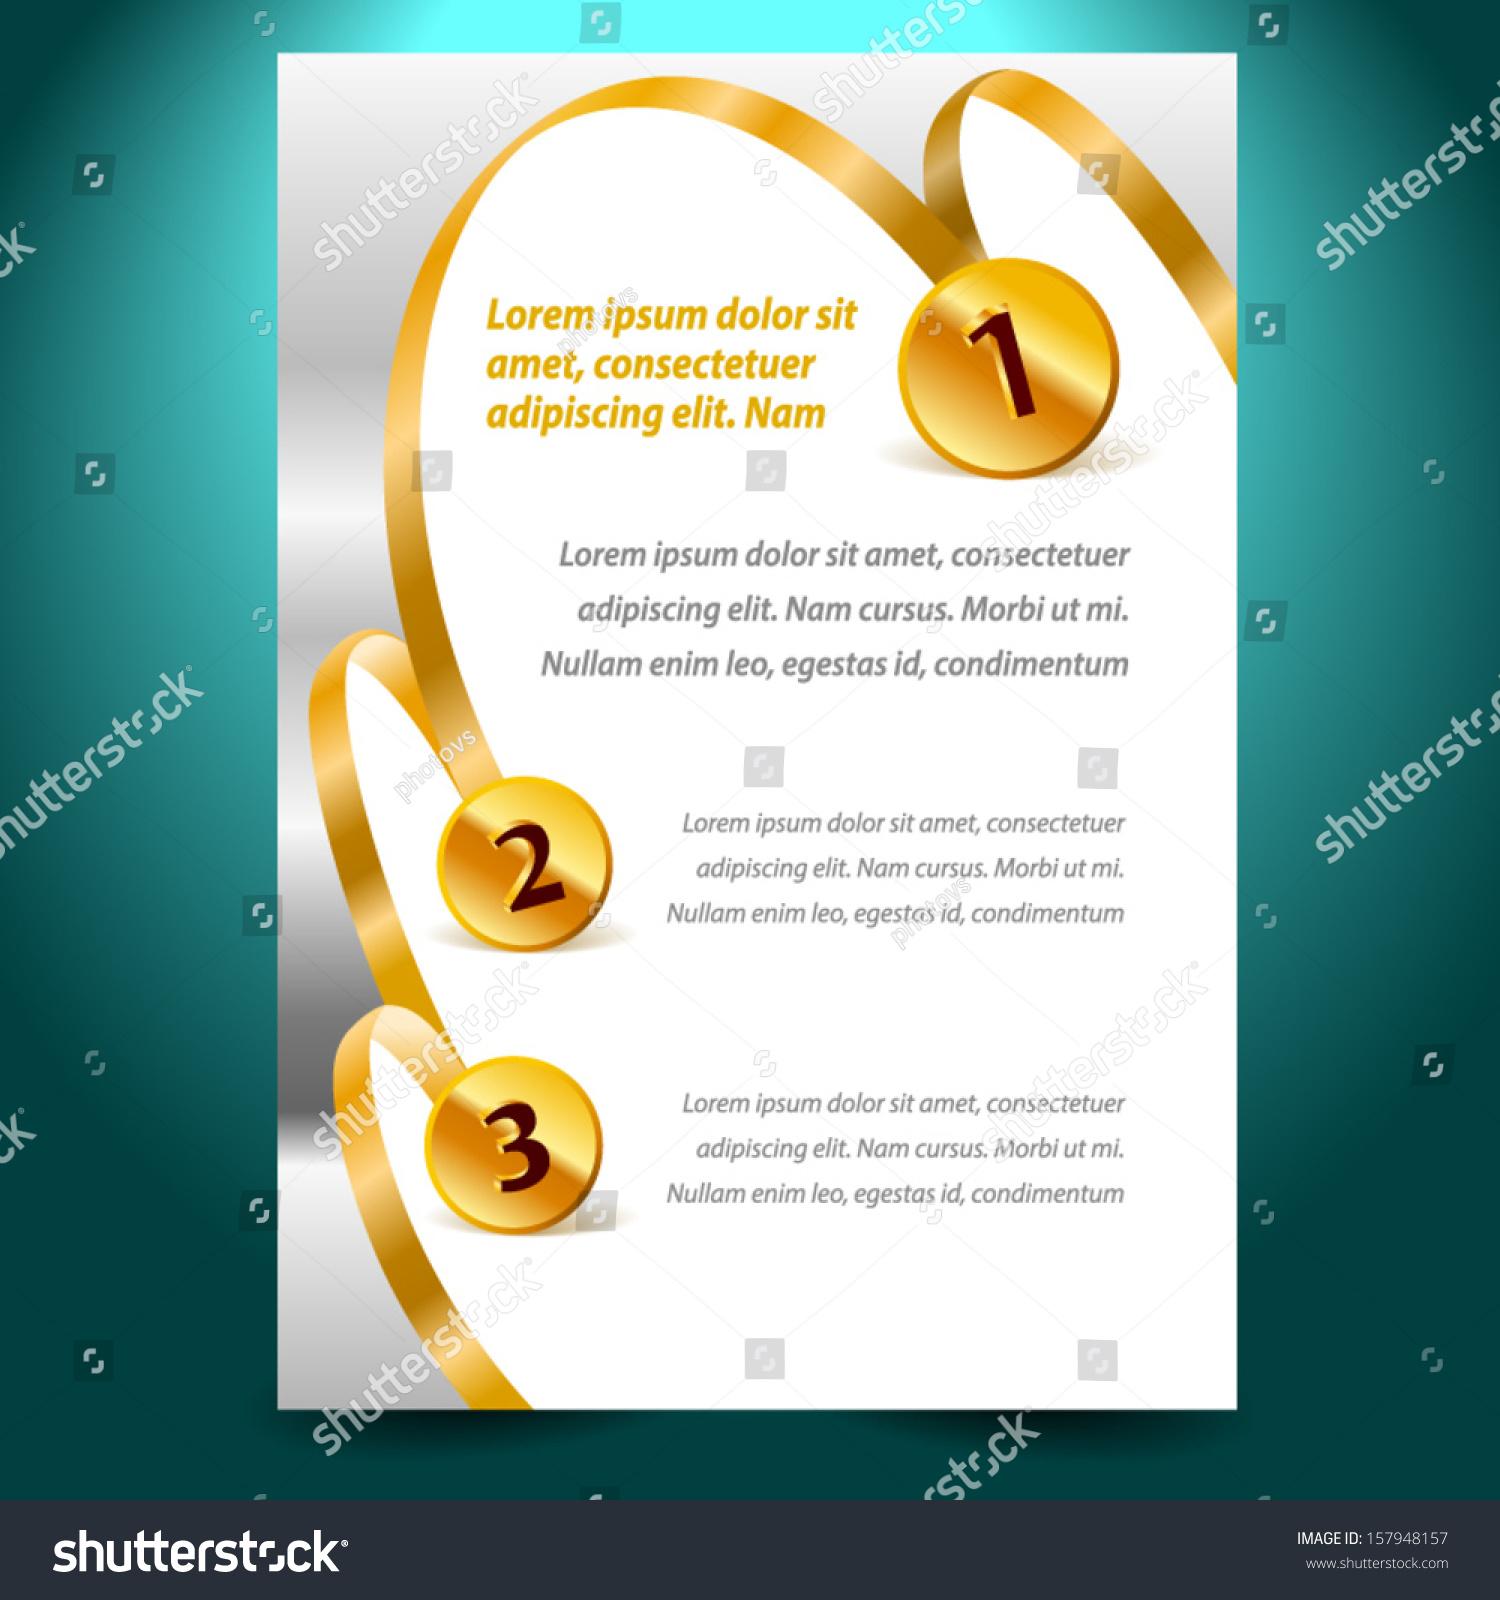 business sharestock certificate